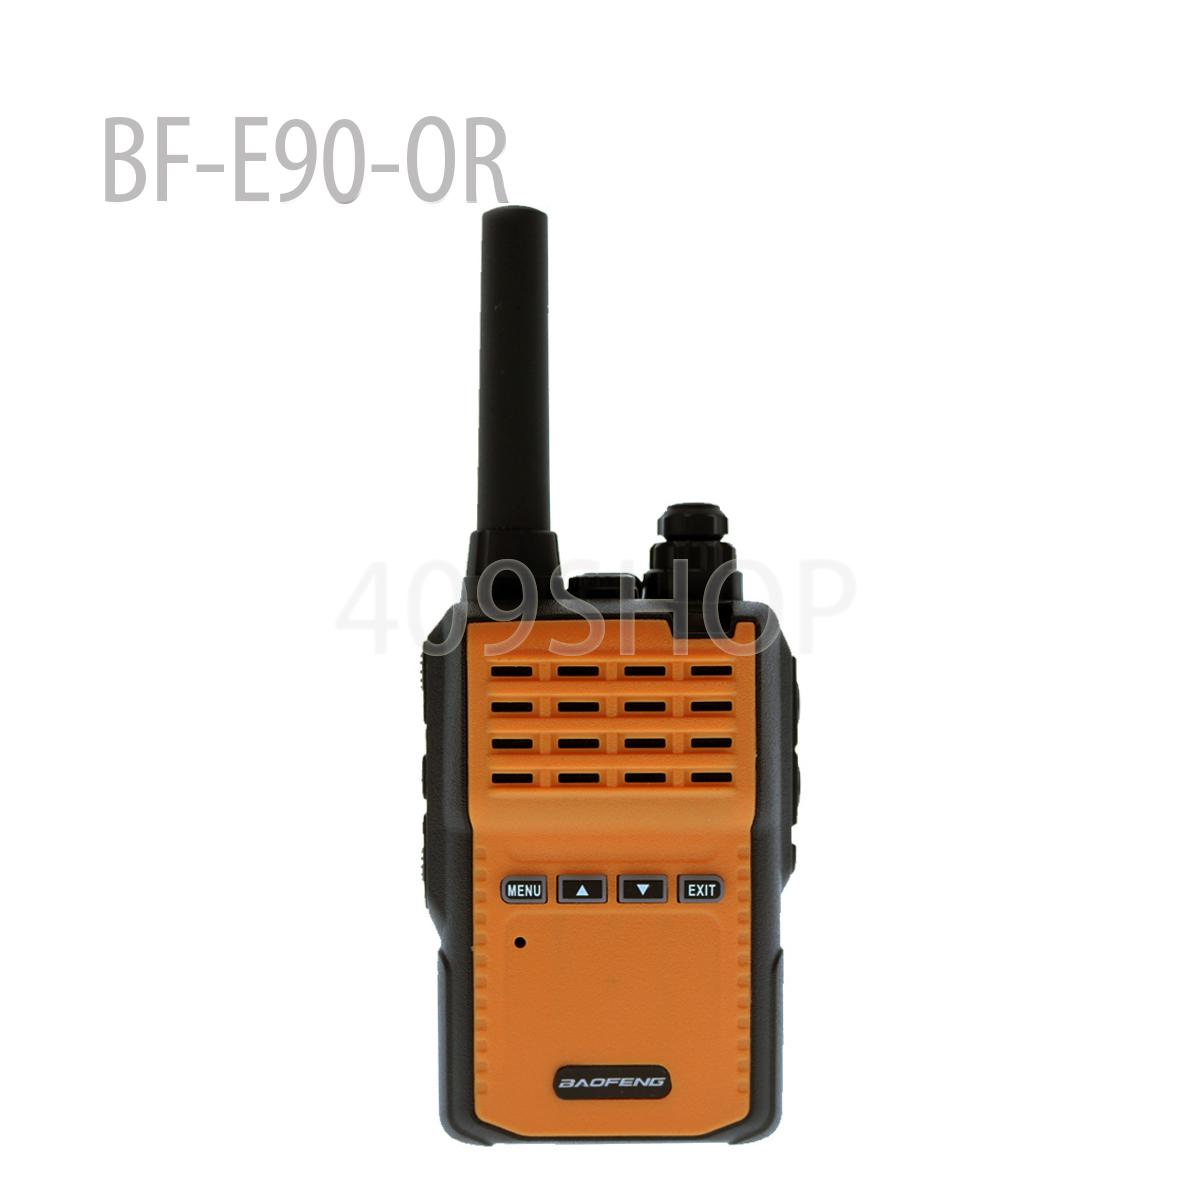 BAOFENG BF-E90-OR Mini Two Way Radio UHF 400-470 MHZOrange